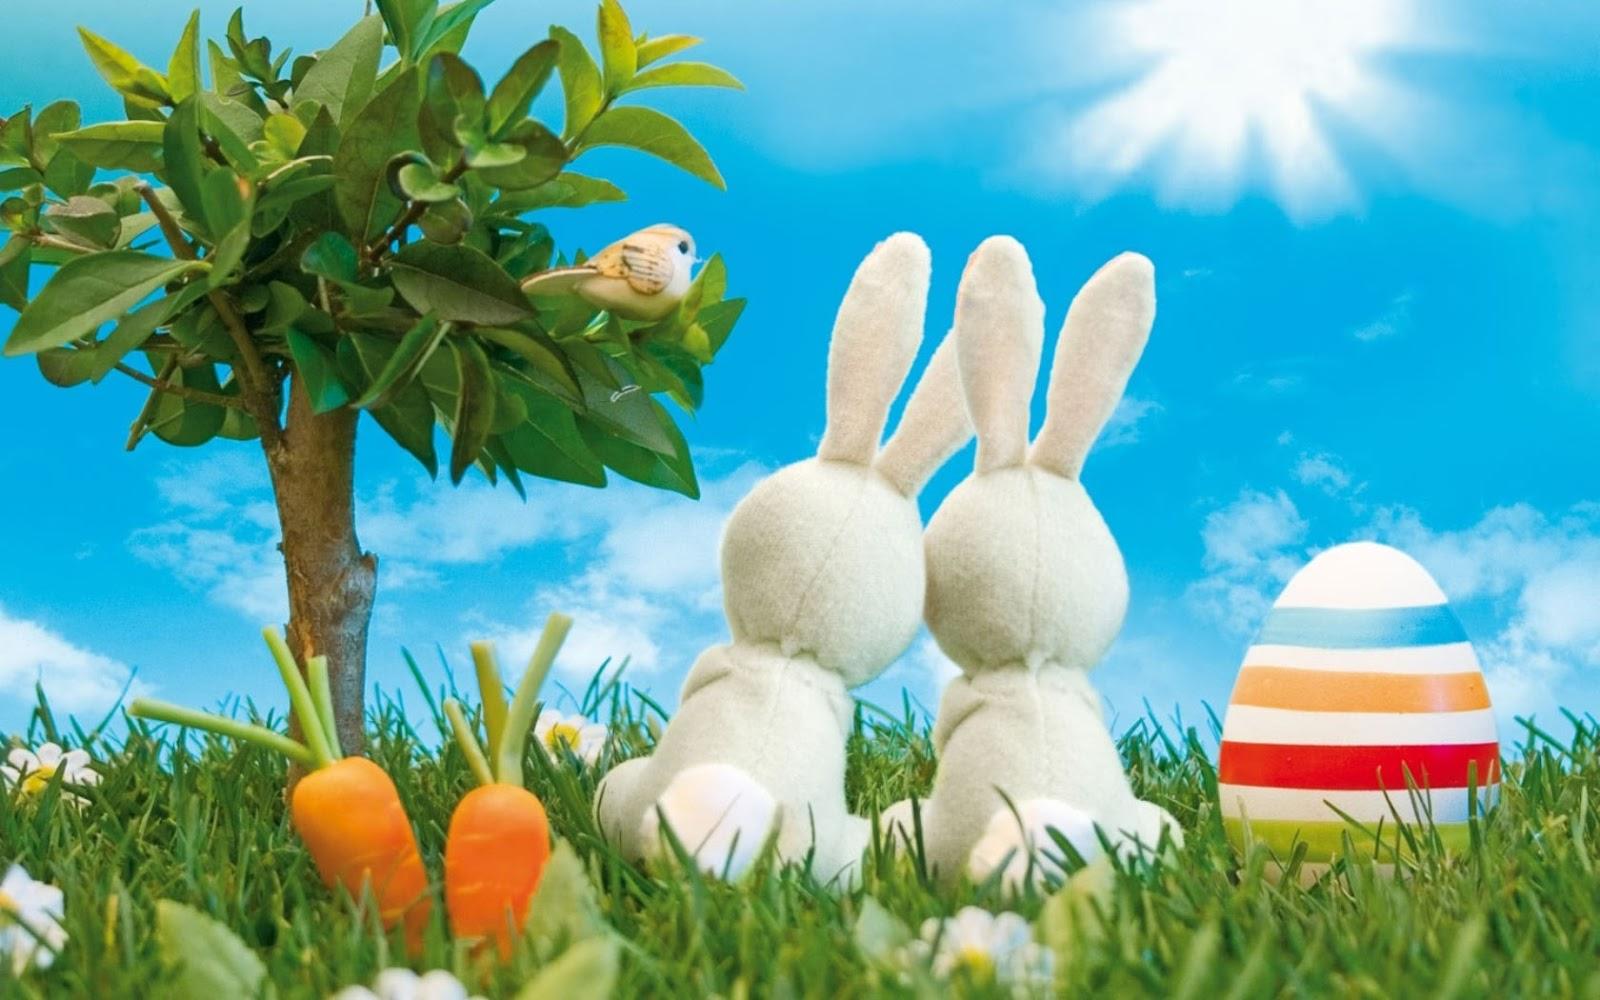 http://1.bp.blogspot.com/-vxUT32ytBoY/UVck5oe6qkI/AAAAAAAAQA0/ldQG0QOjt4c/s1600/Easter.jpg